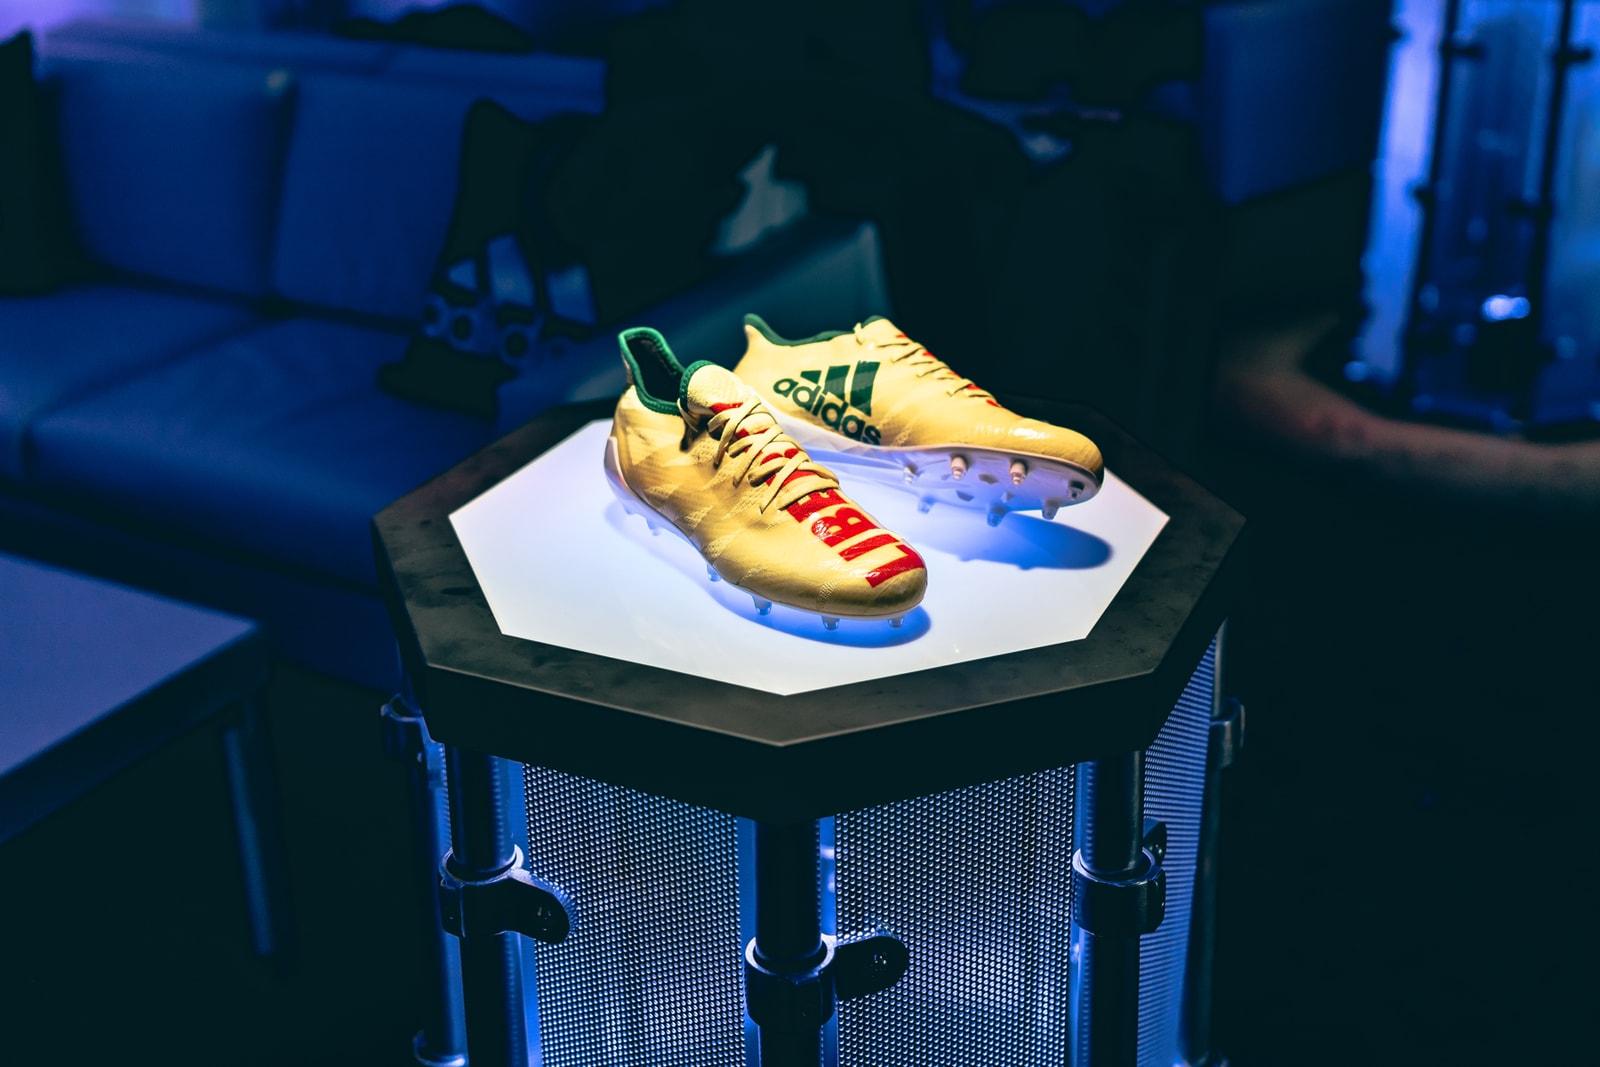 Pharrell Williams adidas Liberty + Justice AM4MN Cleat NFL Football Snoop Dogg Super Bowl LII adidas Originals